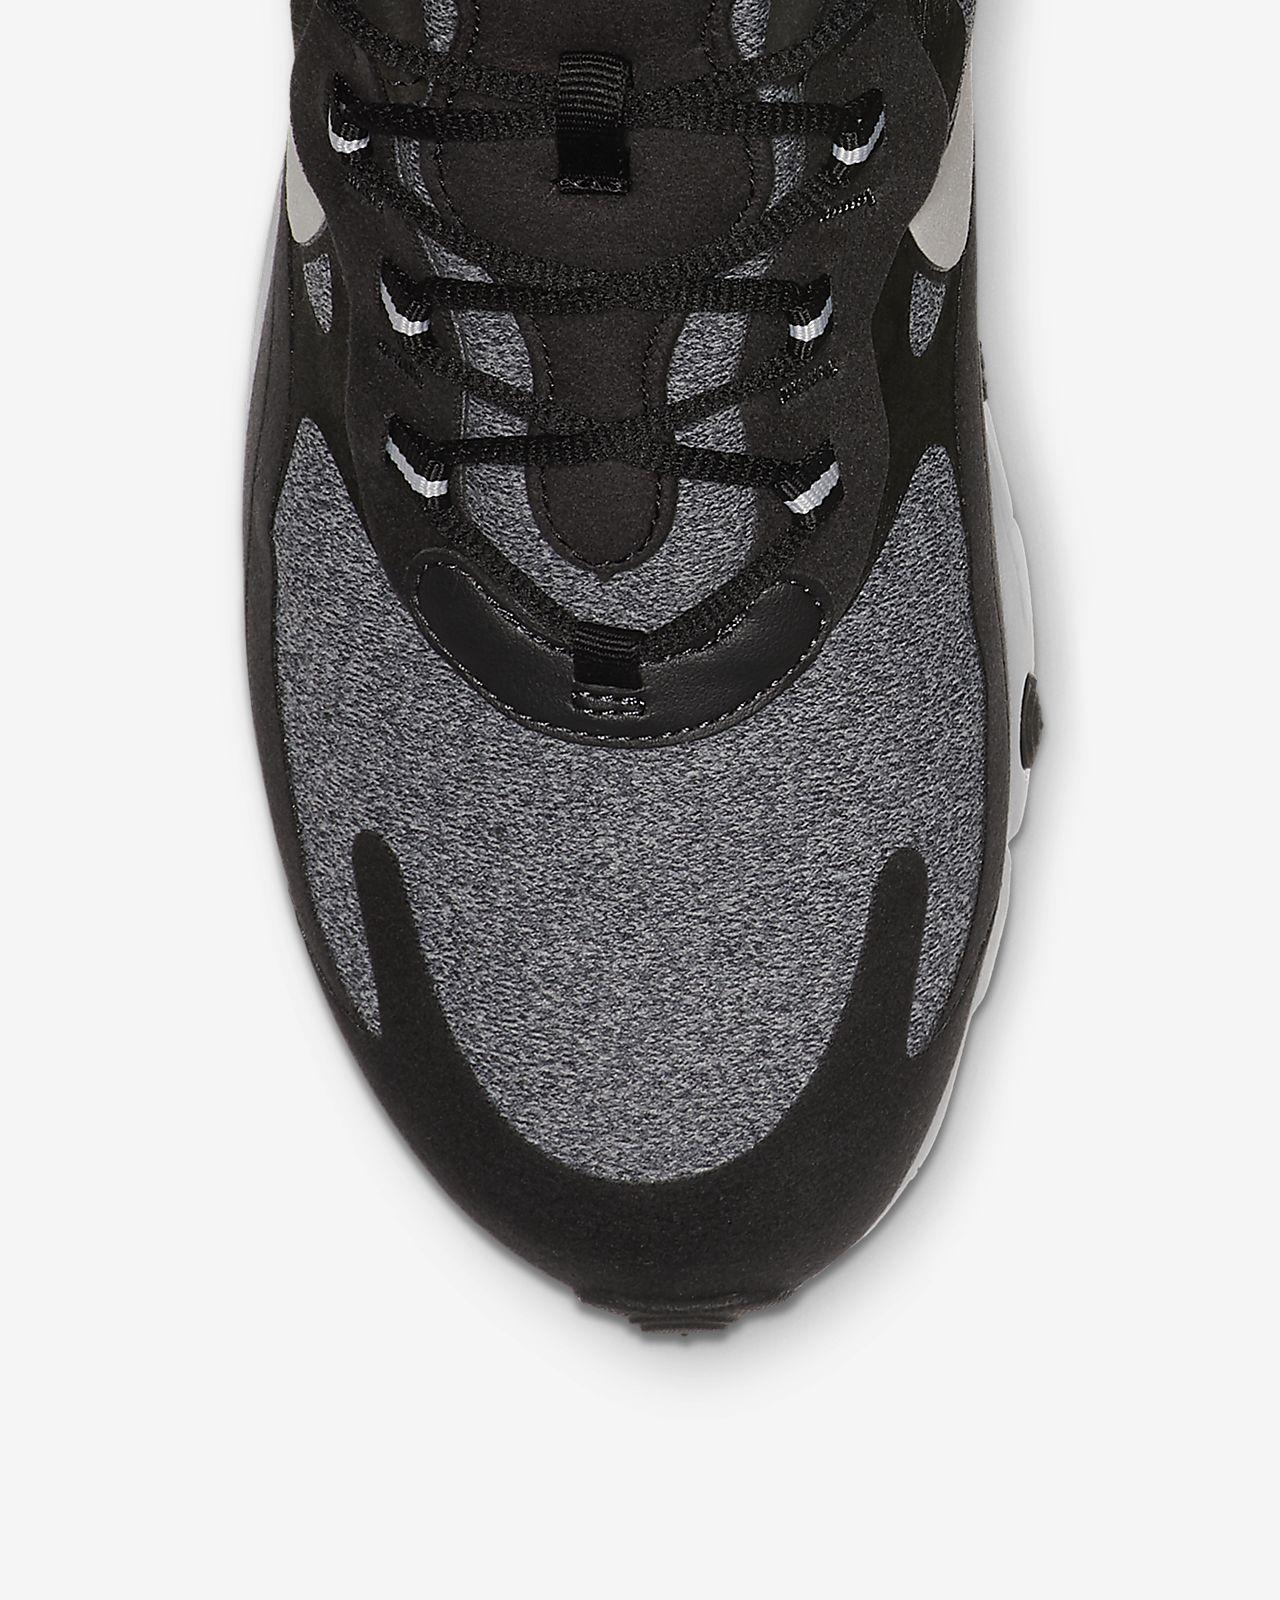 online store 28a8b 4dc6e Nike Air Max 270 React (Op Art) Men's Shoes